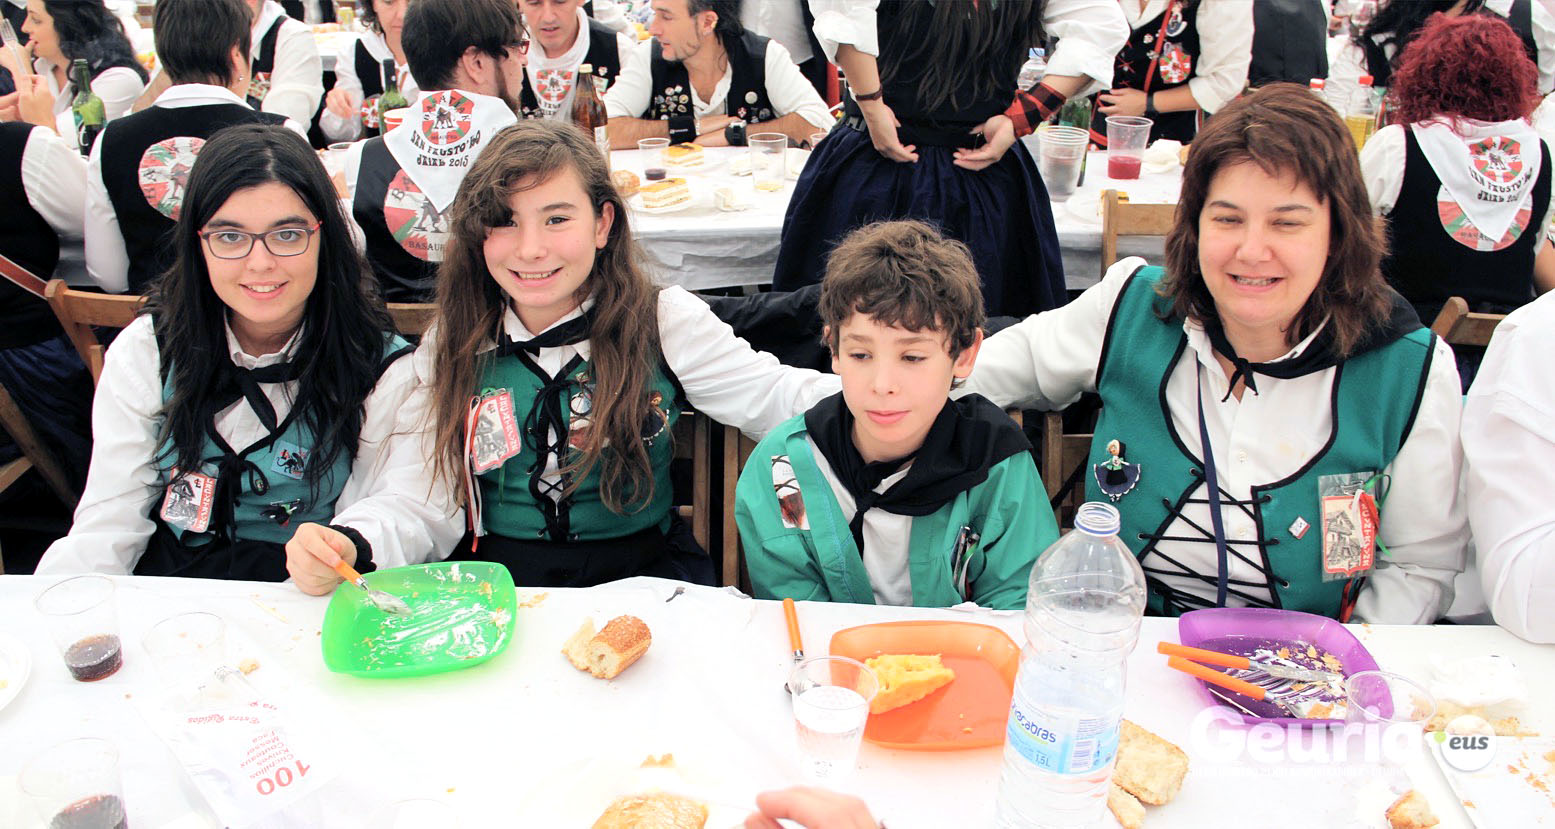 basauri_san_fausto_2015_comida_cuadrilla_16